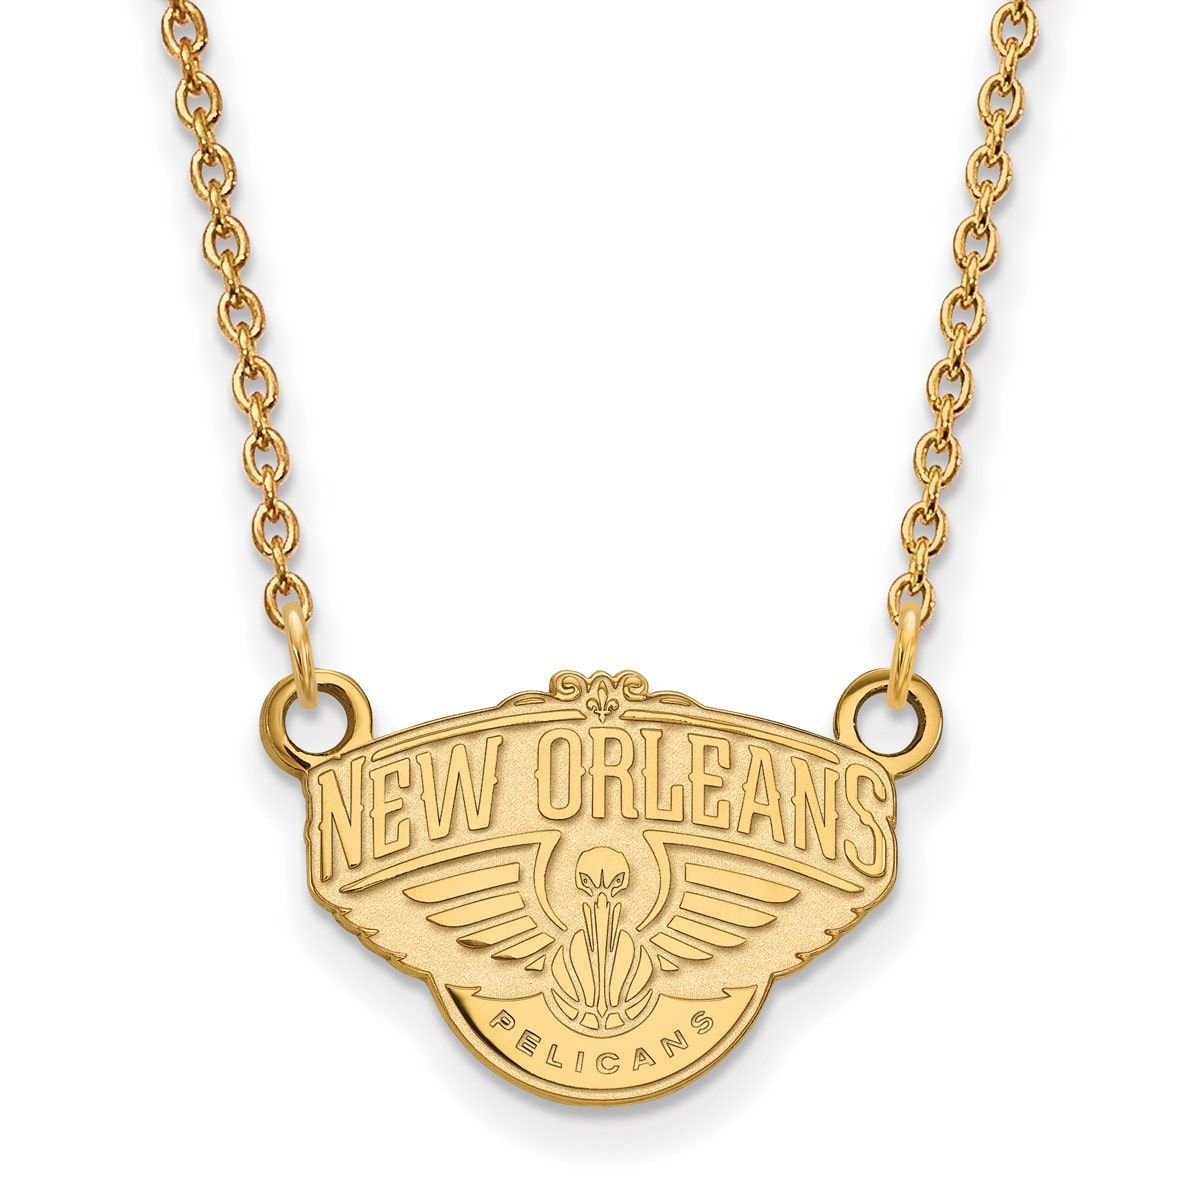 Logoart karat gold new orleans pelicans small pendant with